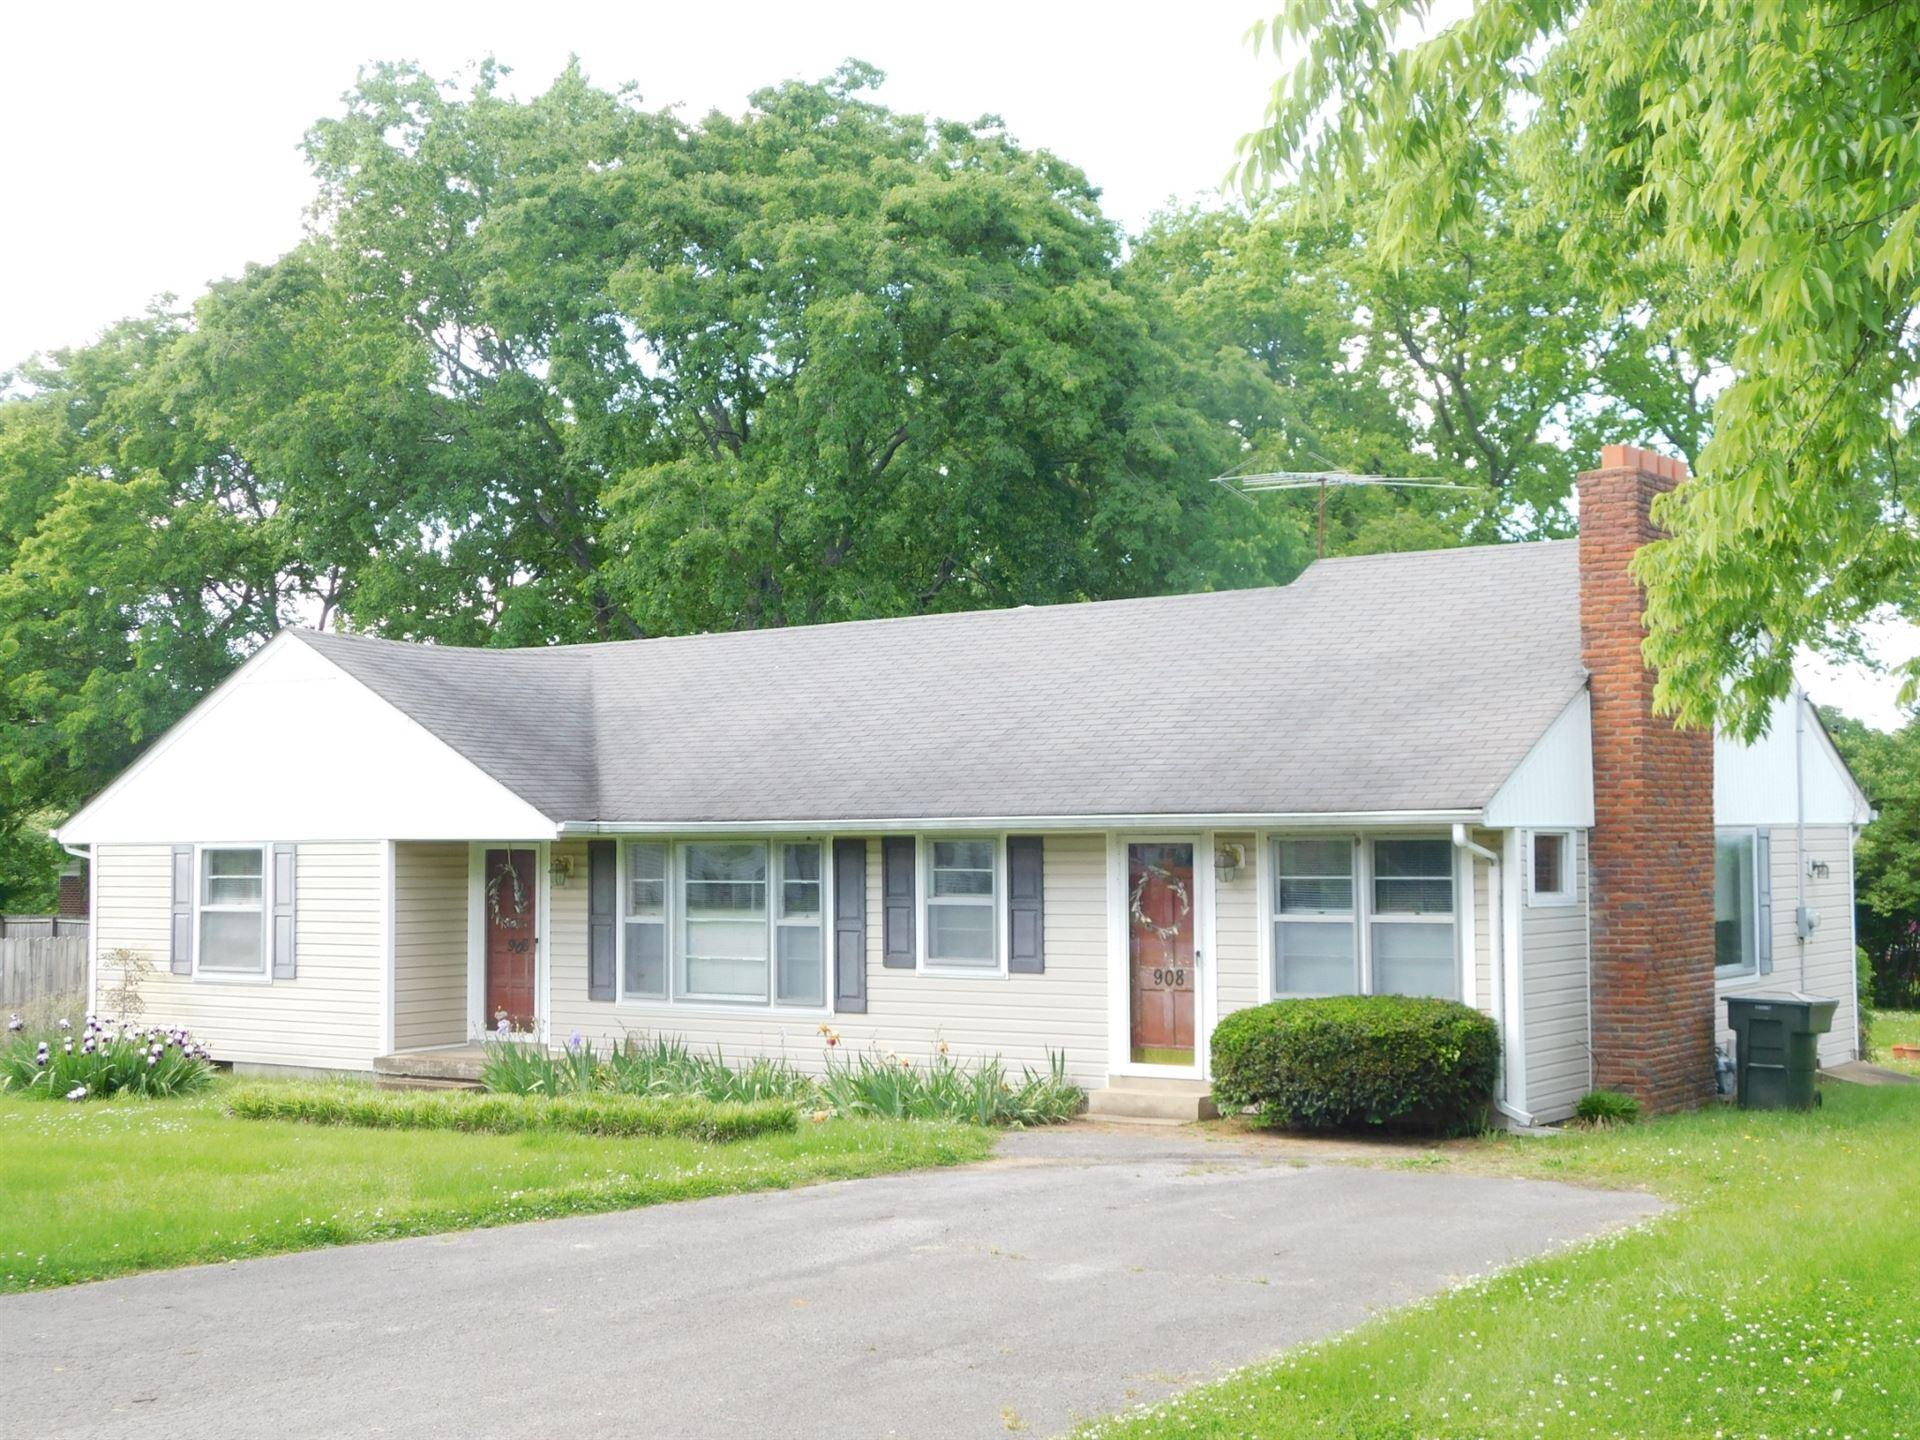 908 Hearn St, Gallatin, TN 37066 - MLS#: 2253639